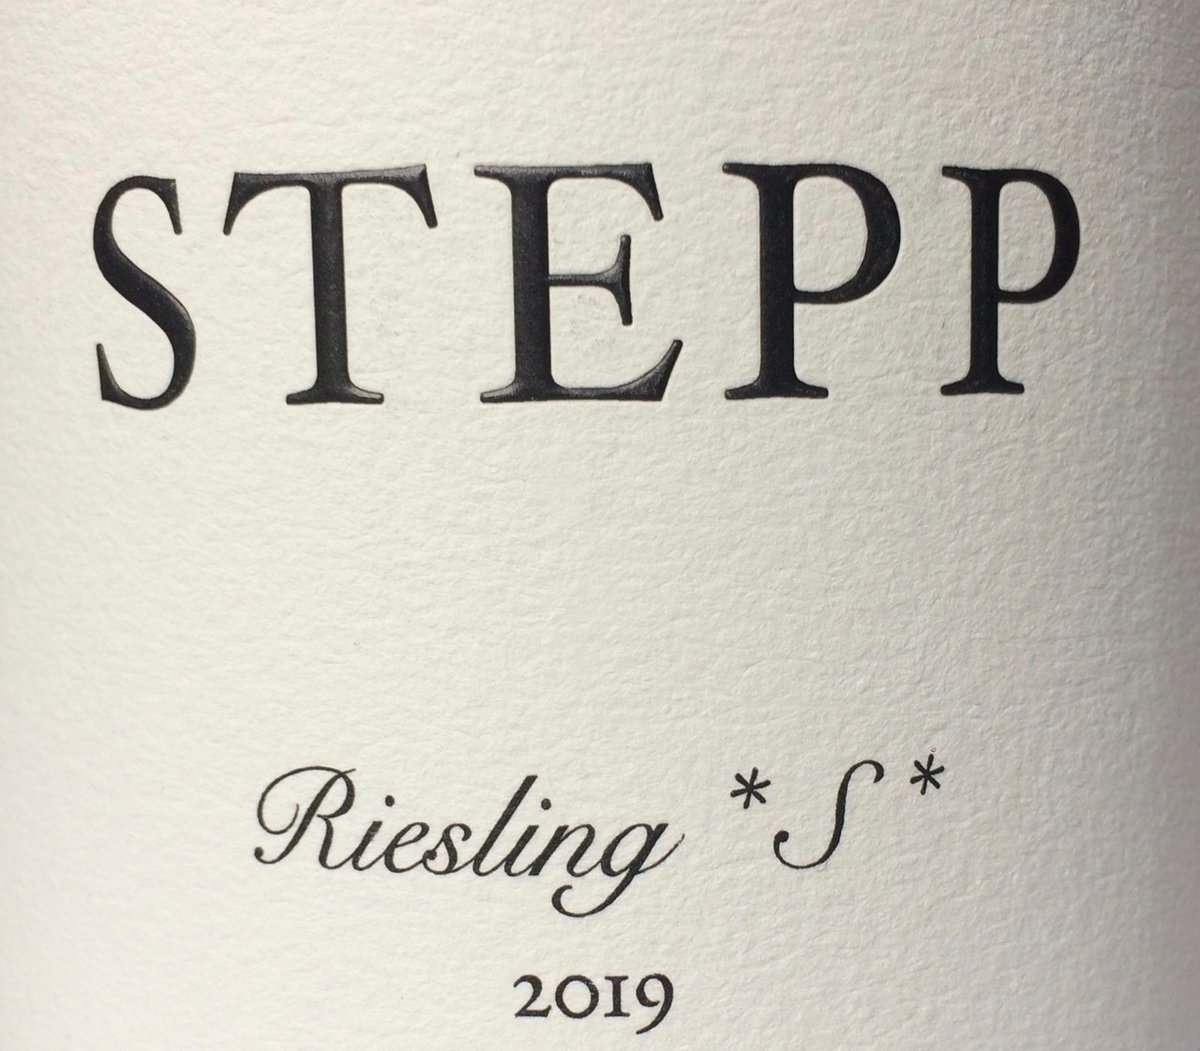 My latest wine of the week is a superb Pfalz Riesling from @gerdstepp and @marksandspencer.  https:// timatkin.com/tasting-notes/ stepp-riesling-s-kallstadter-saumagen/  …  #drinkbetterwine <br>http://pic.twitter.com/zkDWQBfRvO